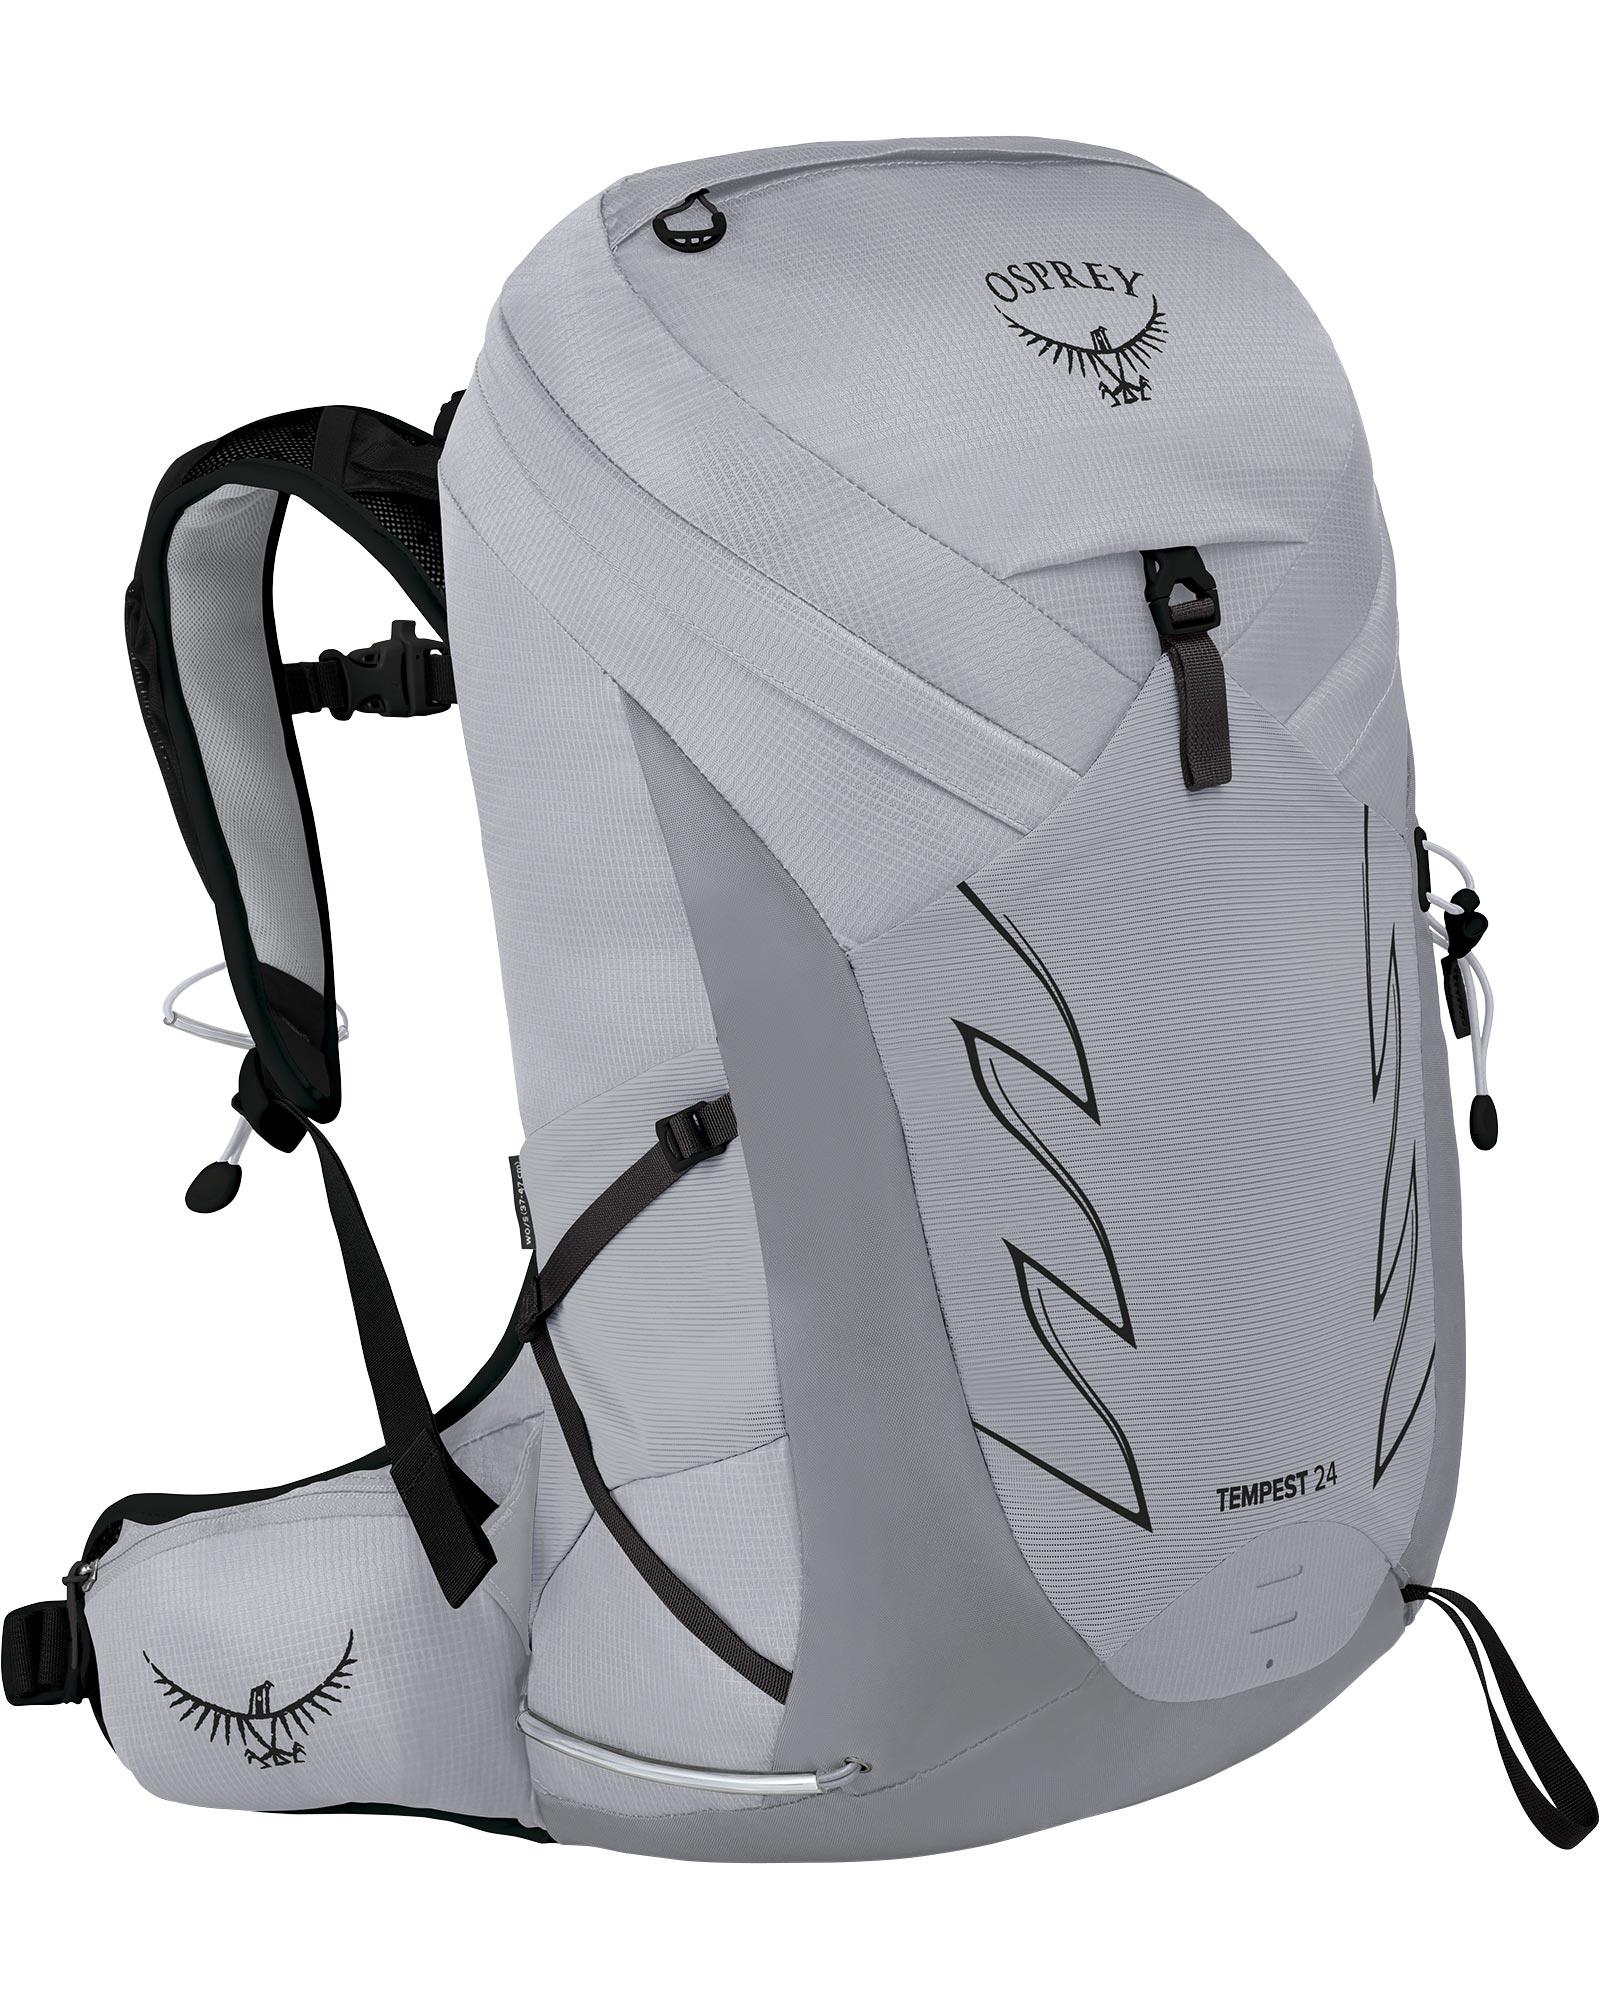 Osprey Women's Tempest 24 Backpack 0